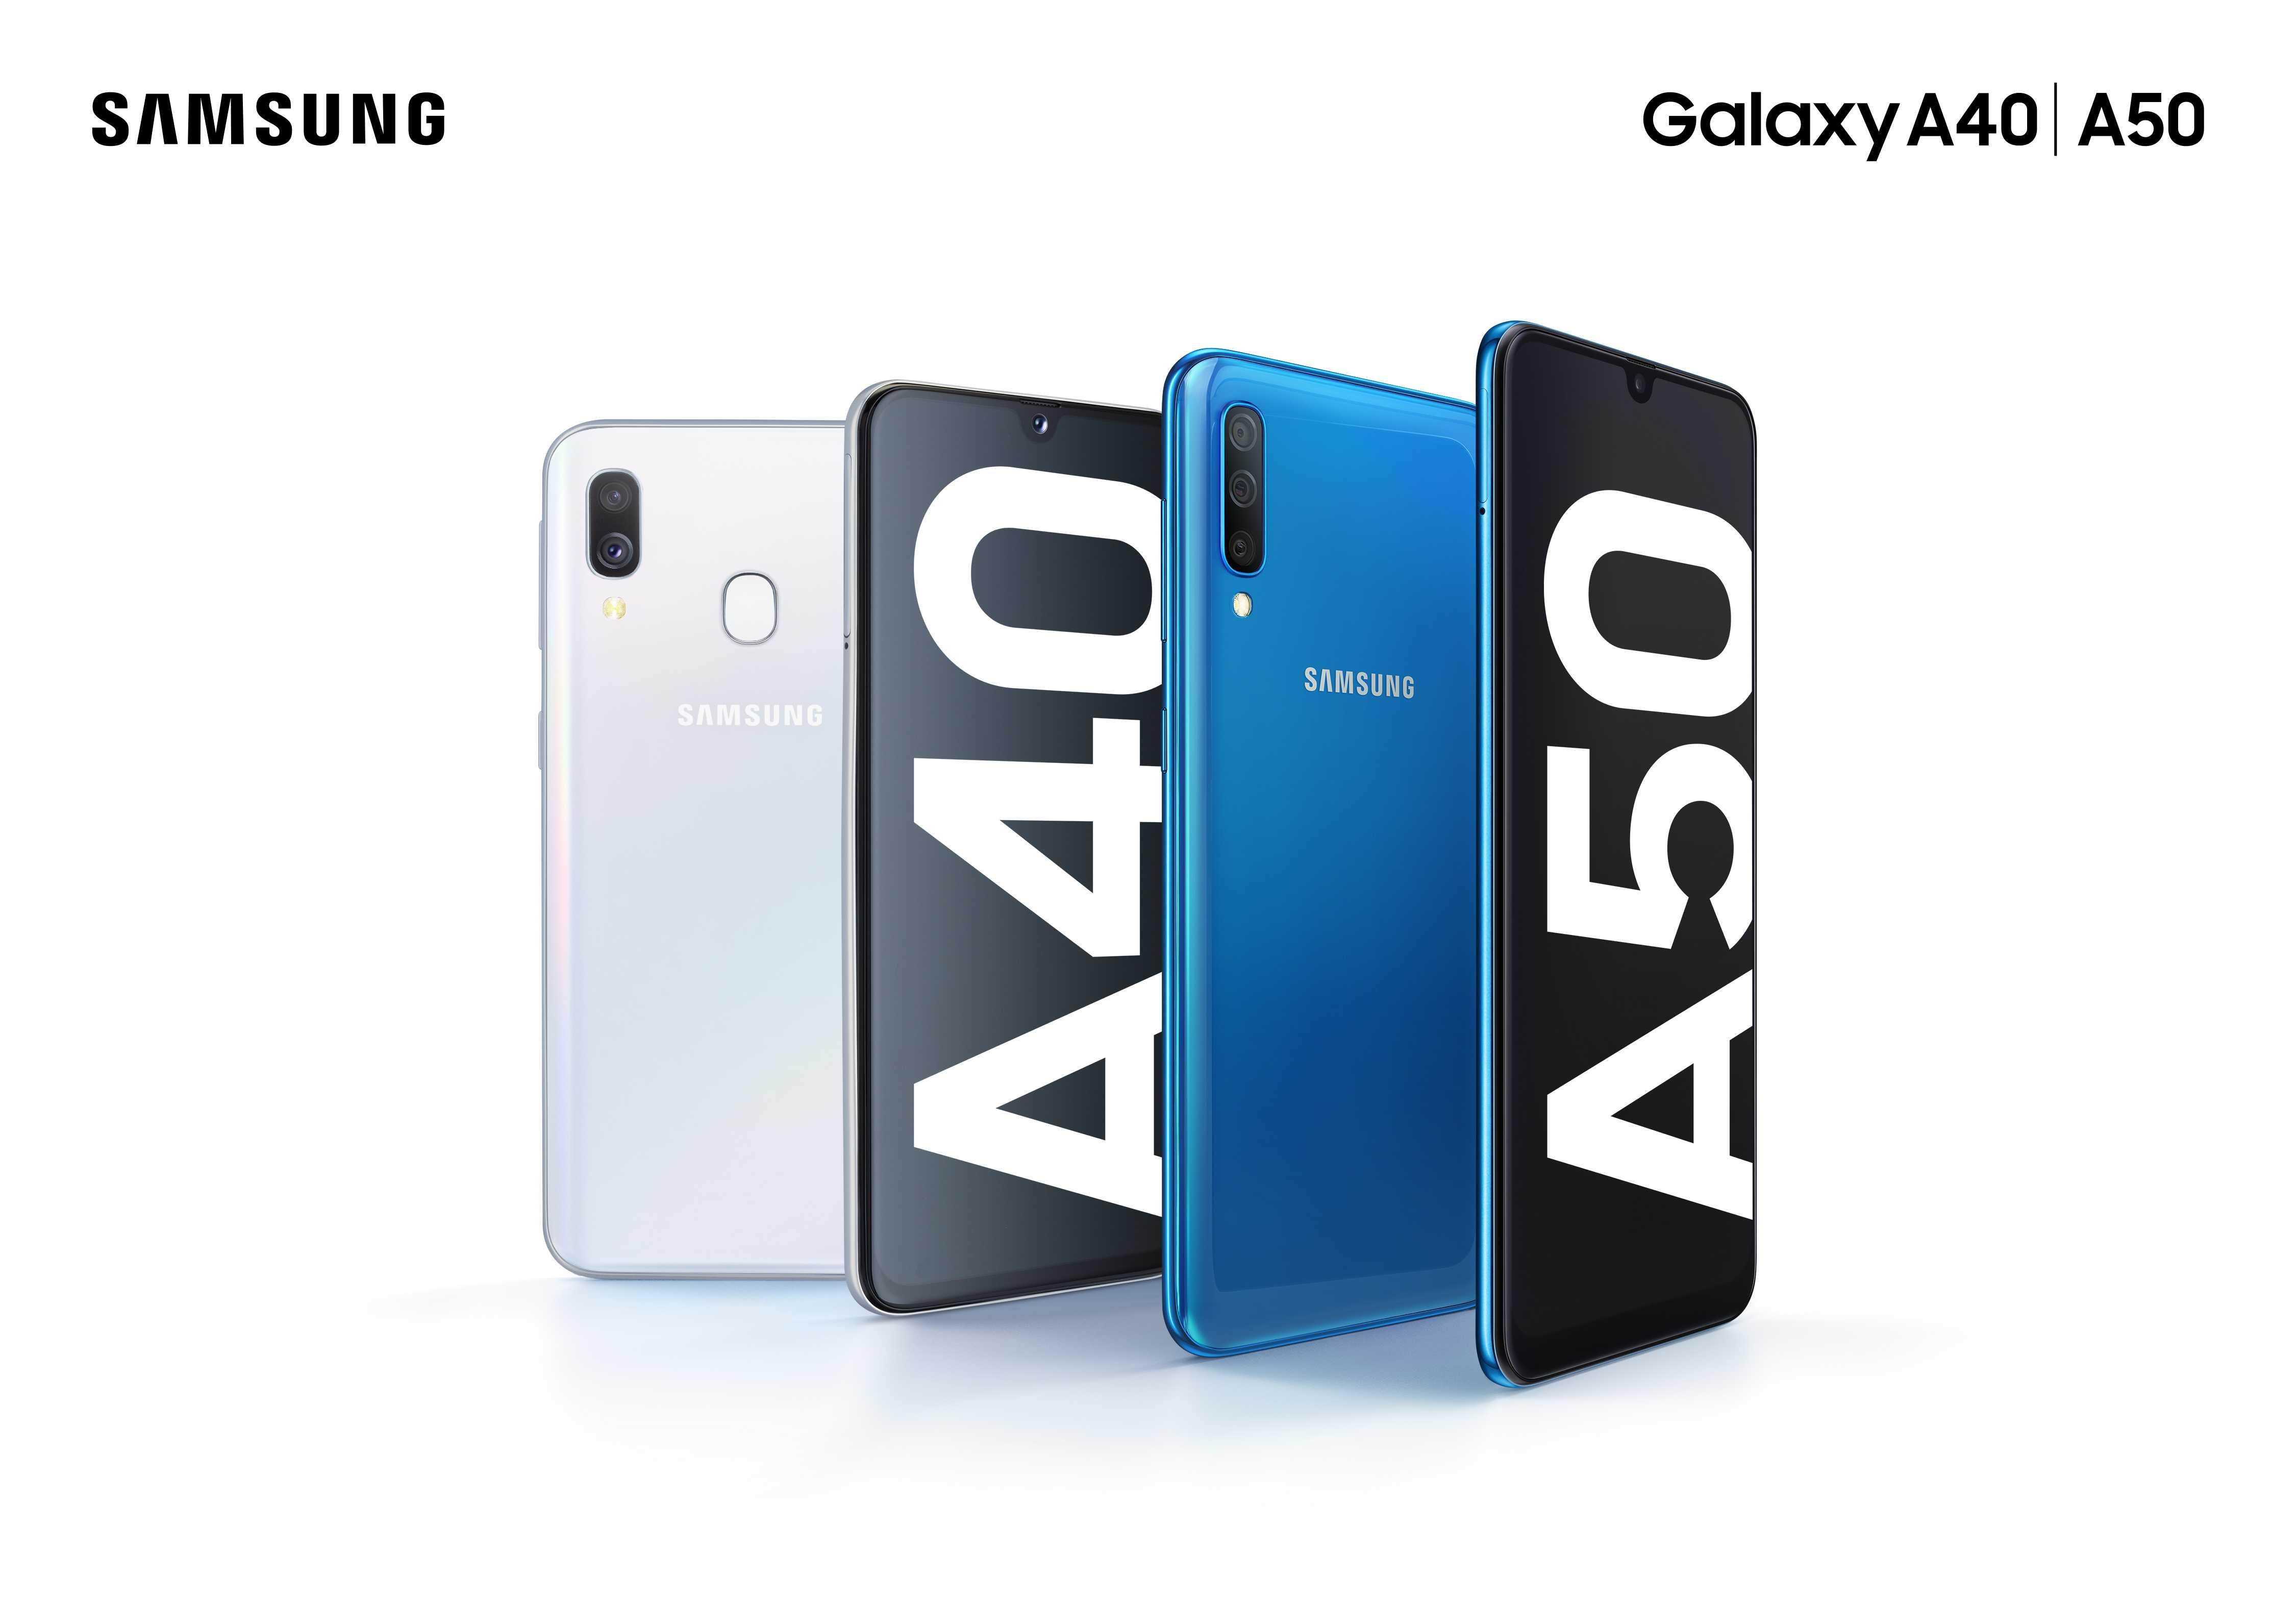 Samsung Galaxy A40-A50